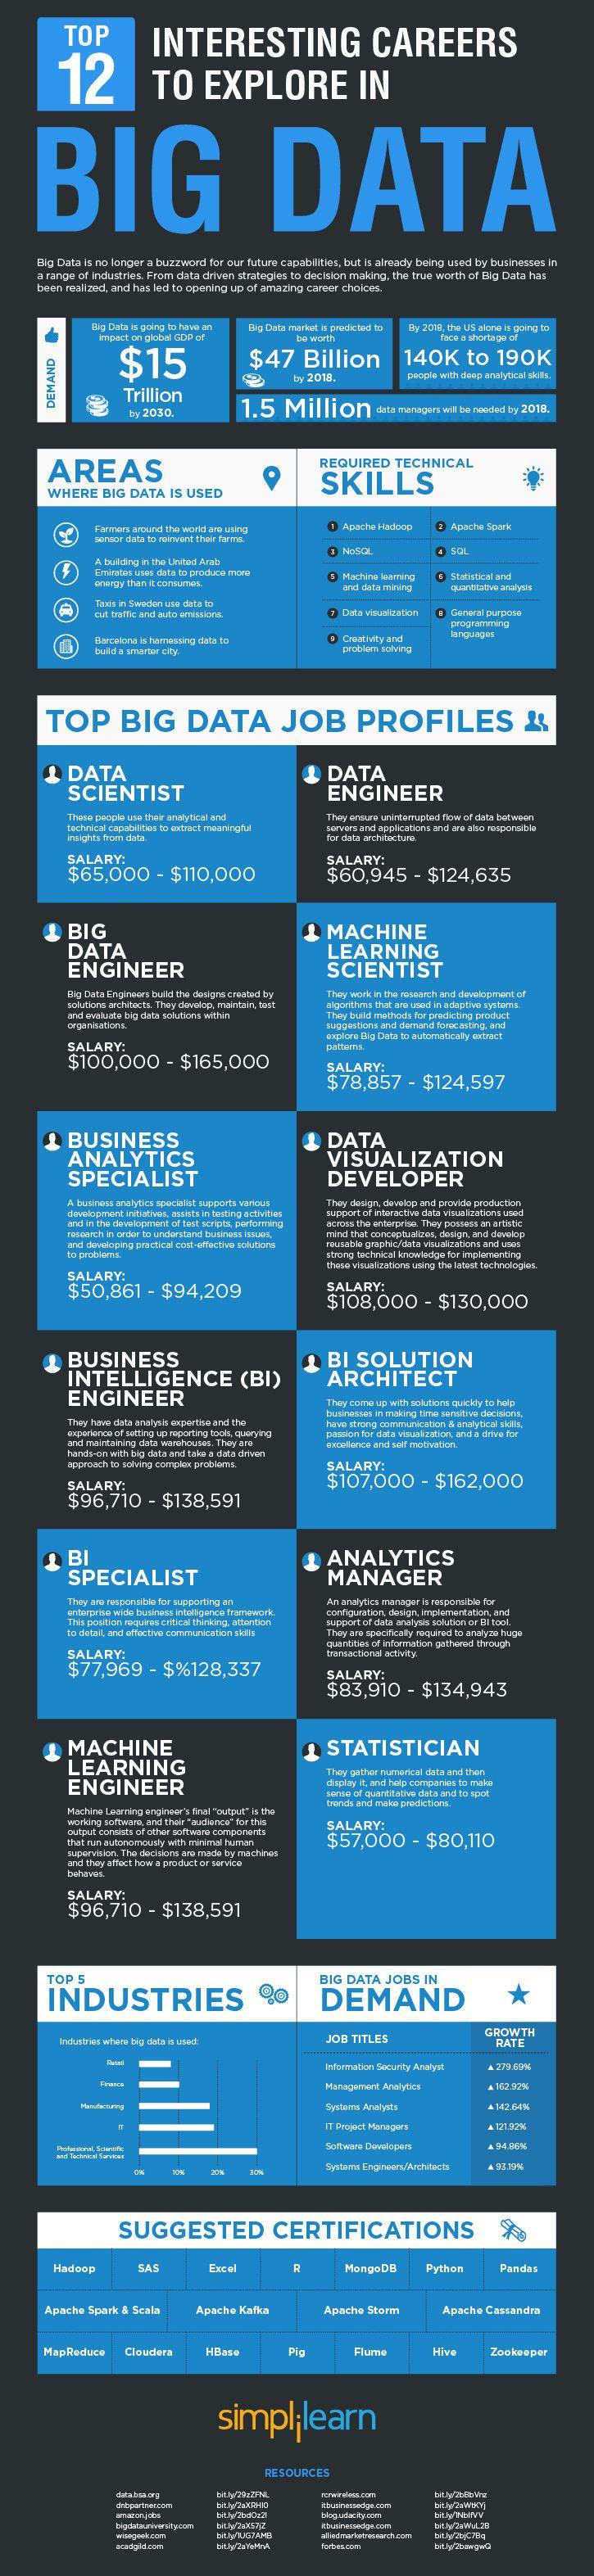 12 Interesting Big Data Careers To Explore